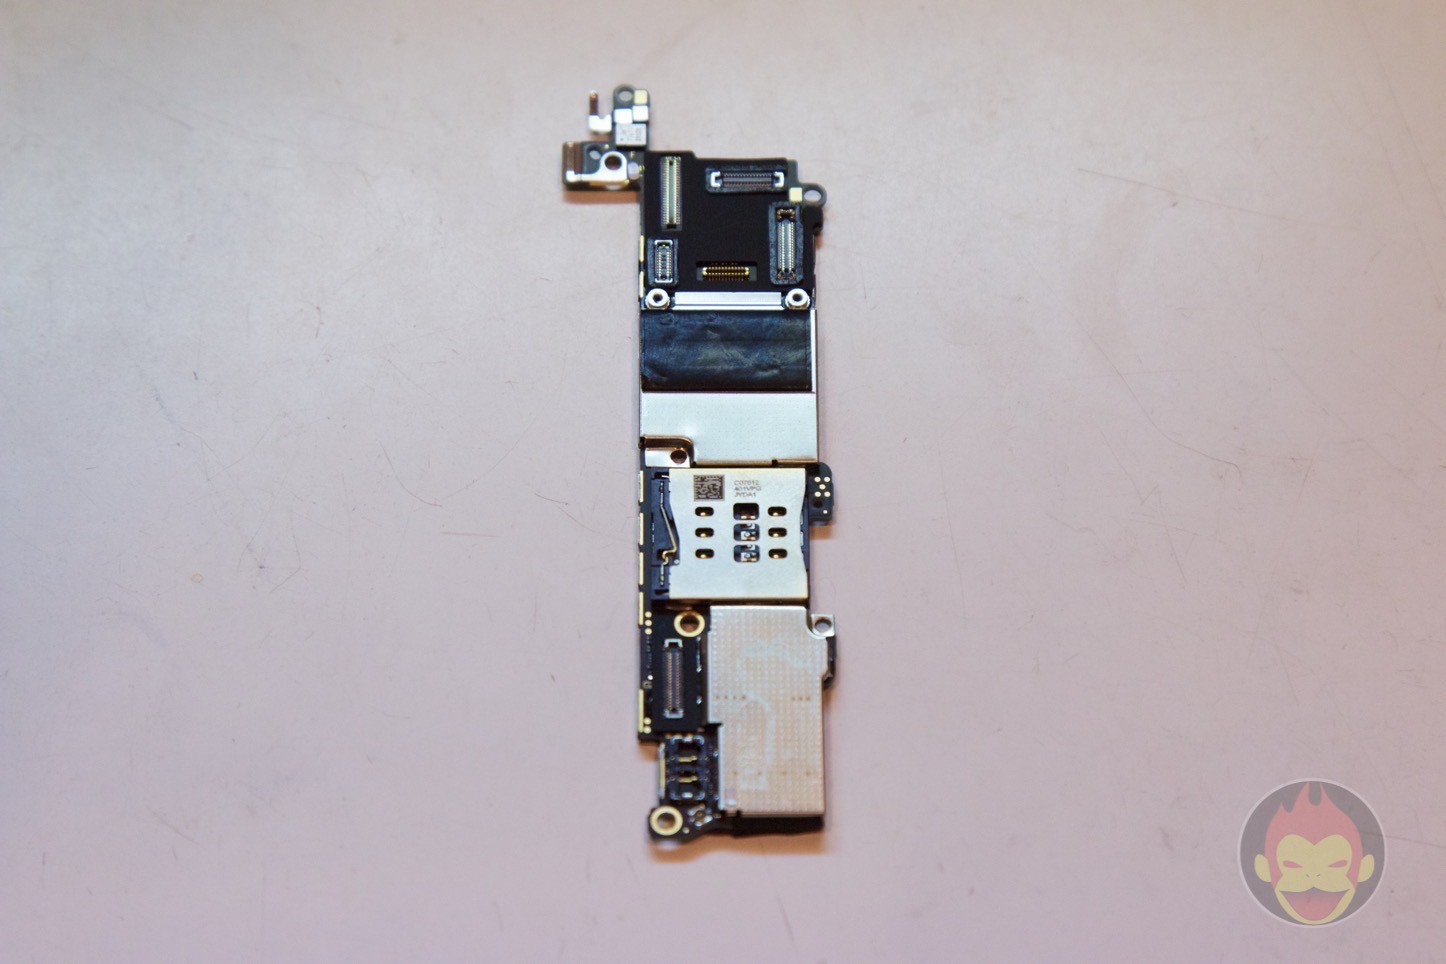 iPhone-SE-decompose-23.jpg